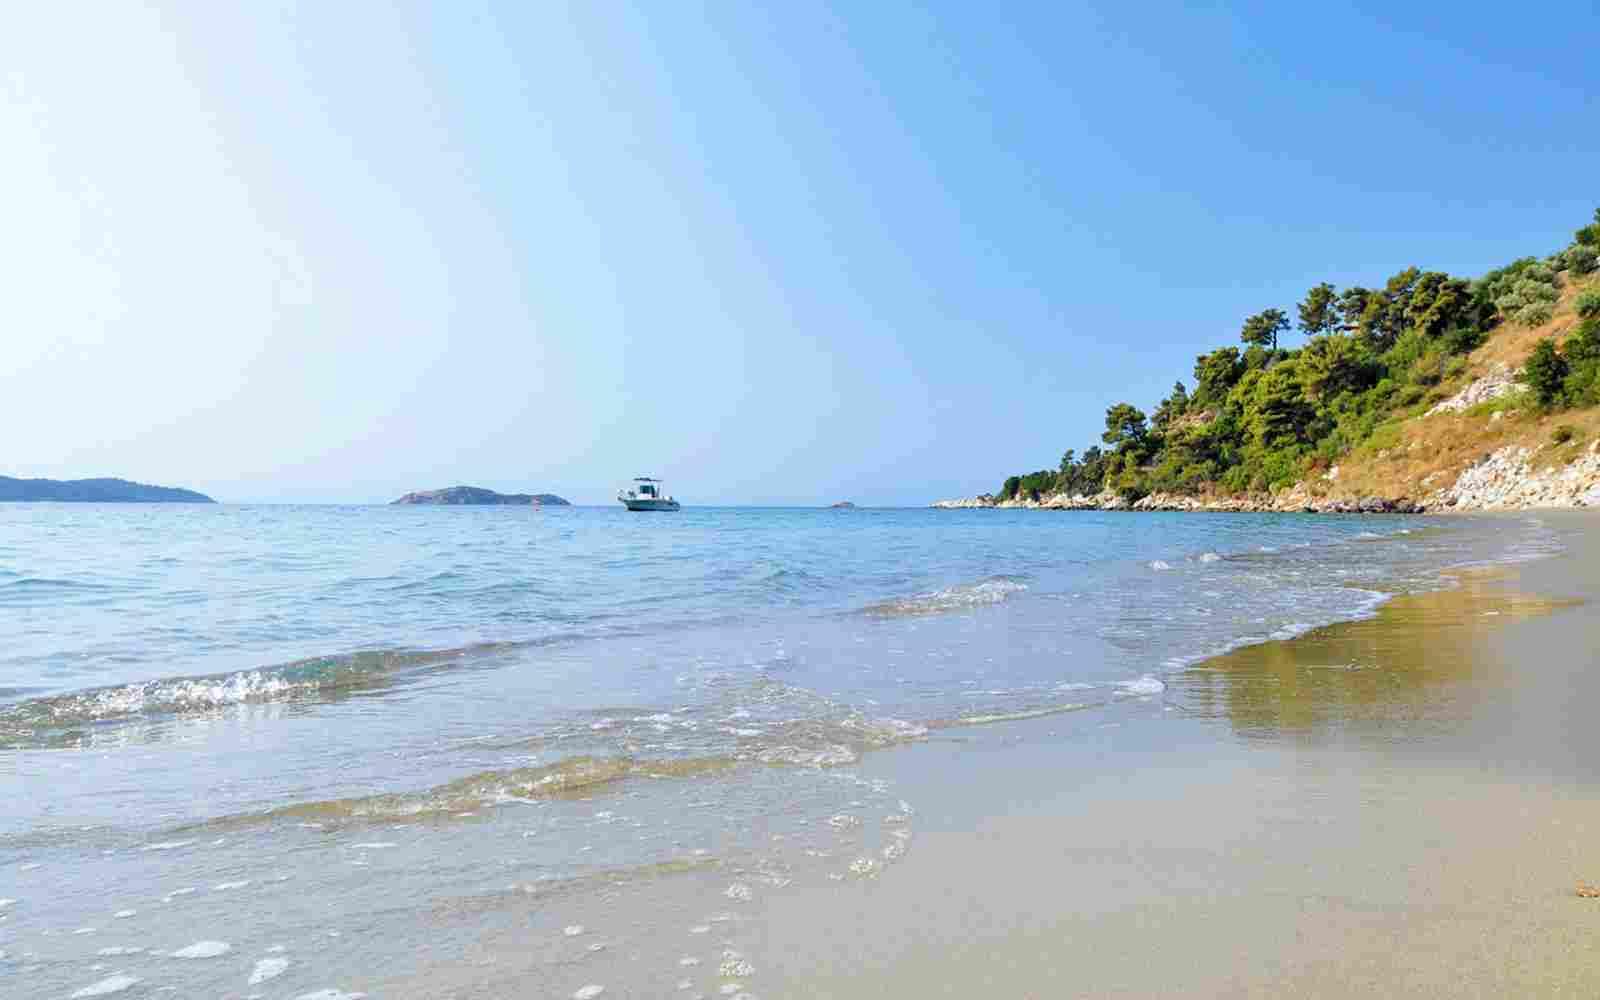 https://mohuamotels.co.nz/wp-content/uploads/2016/03/summer-beach-01.jpg